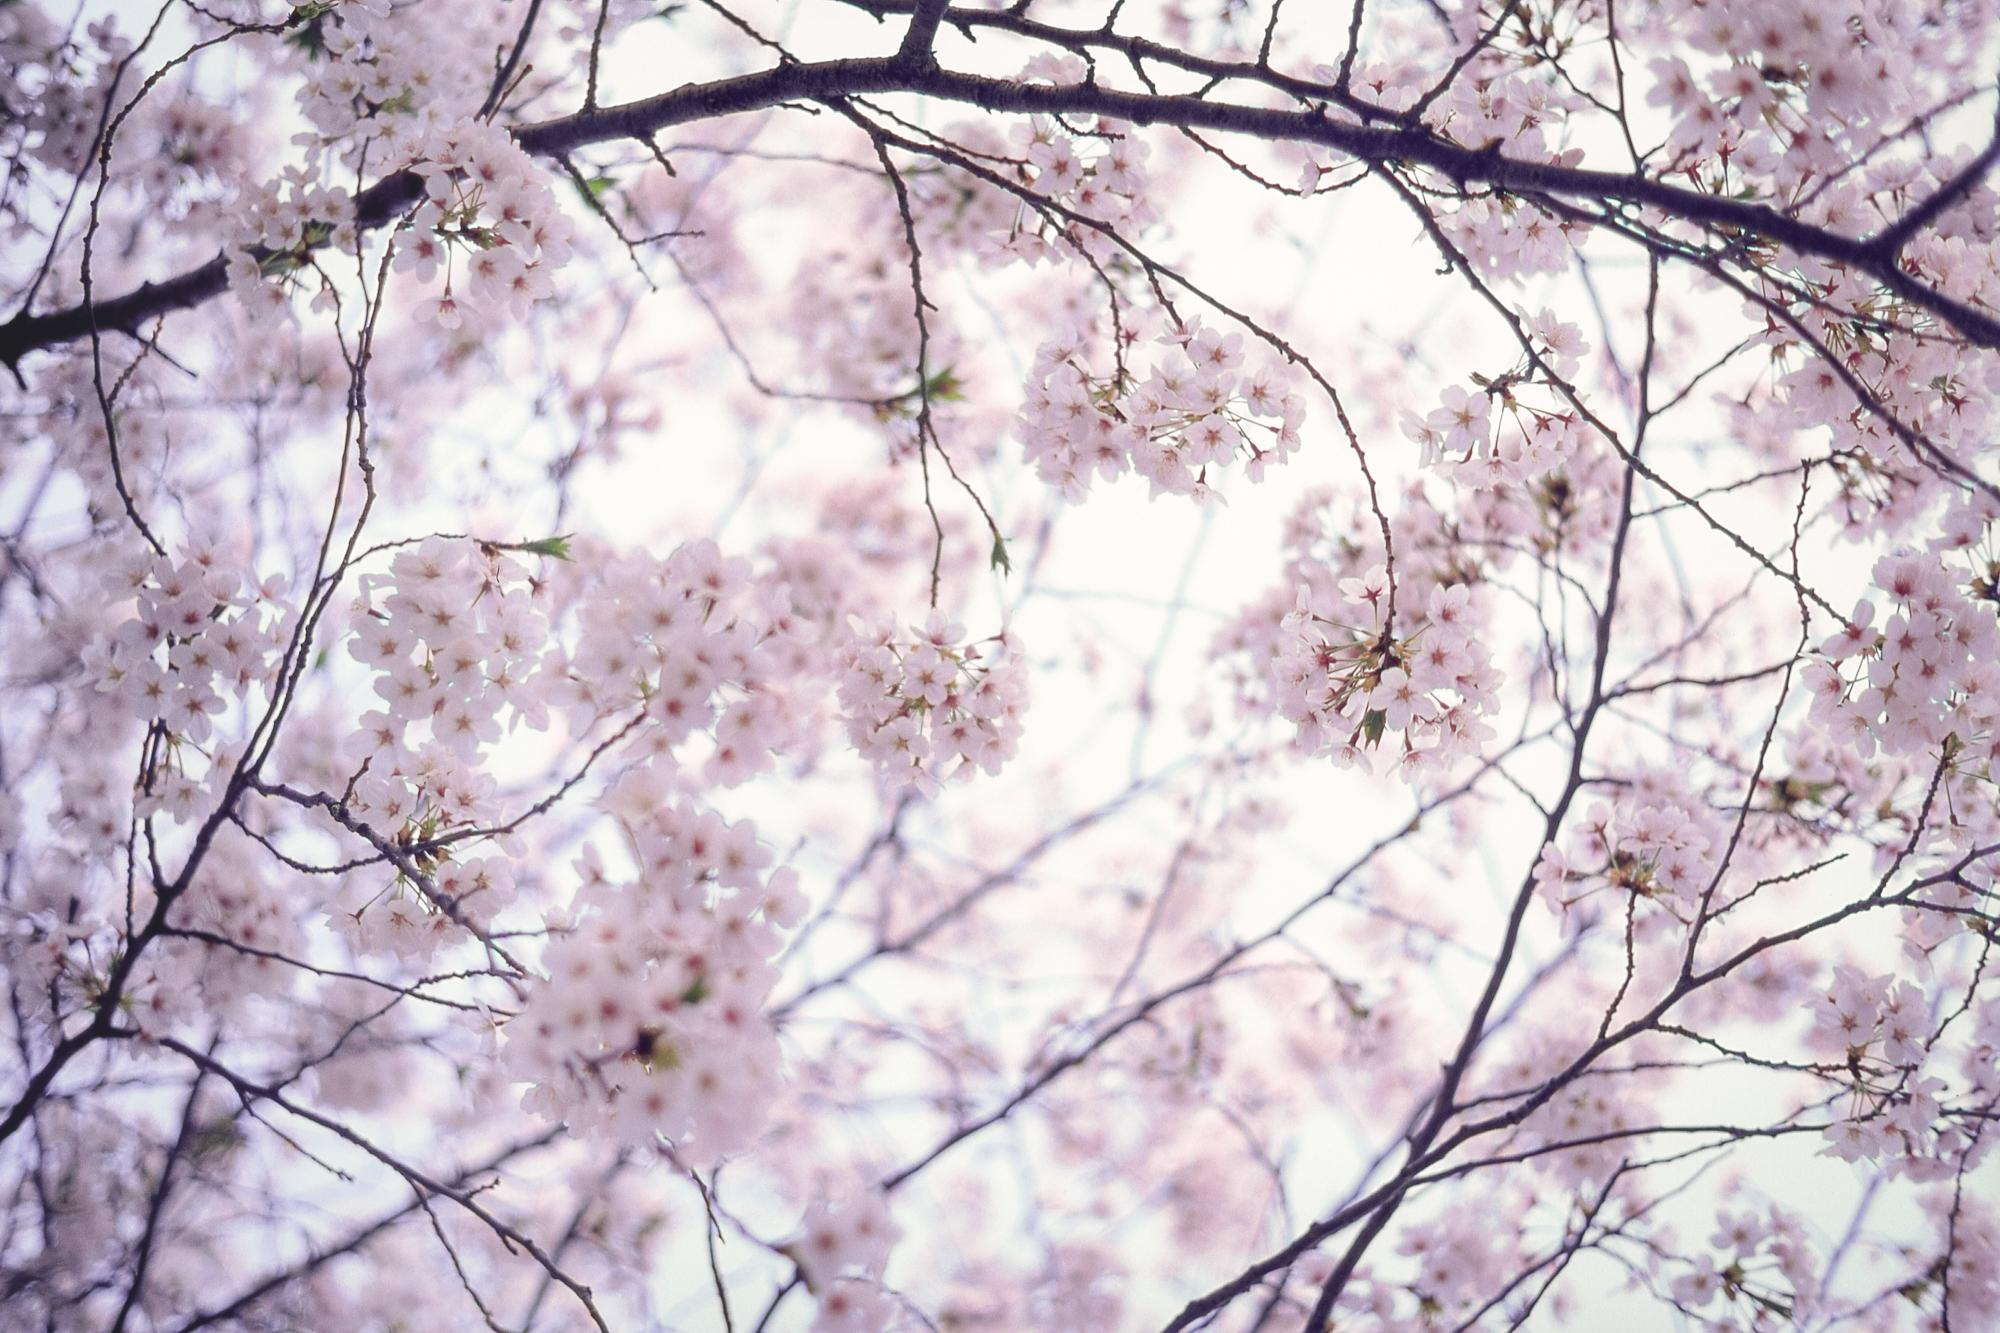 Sakura blossom  - Tokyo, Japan  PHOTOGRAPHY: ALEXANDER J.E. BRADLEY •Minolta SRT 101 • Kodak film